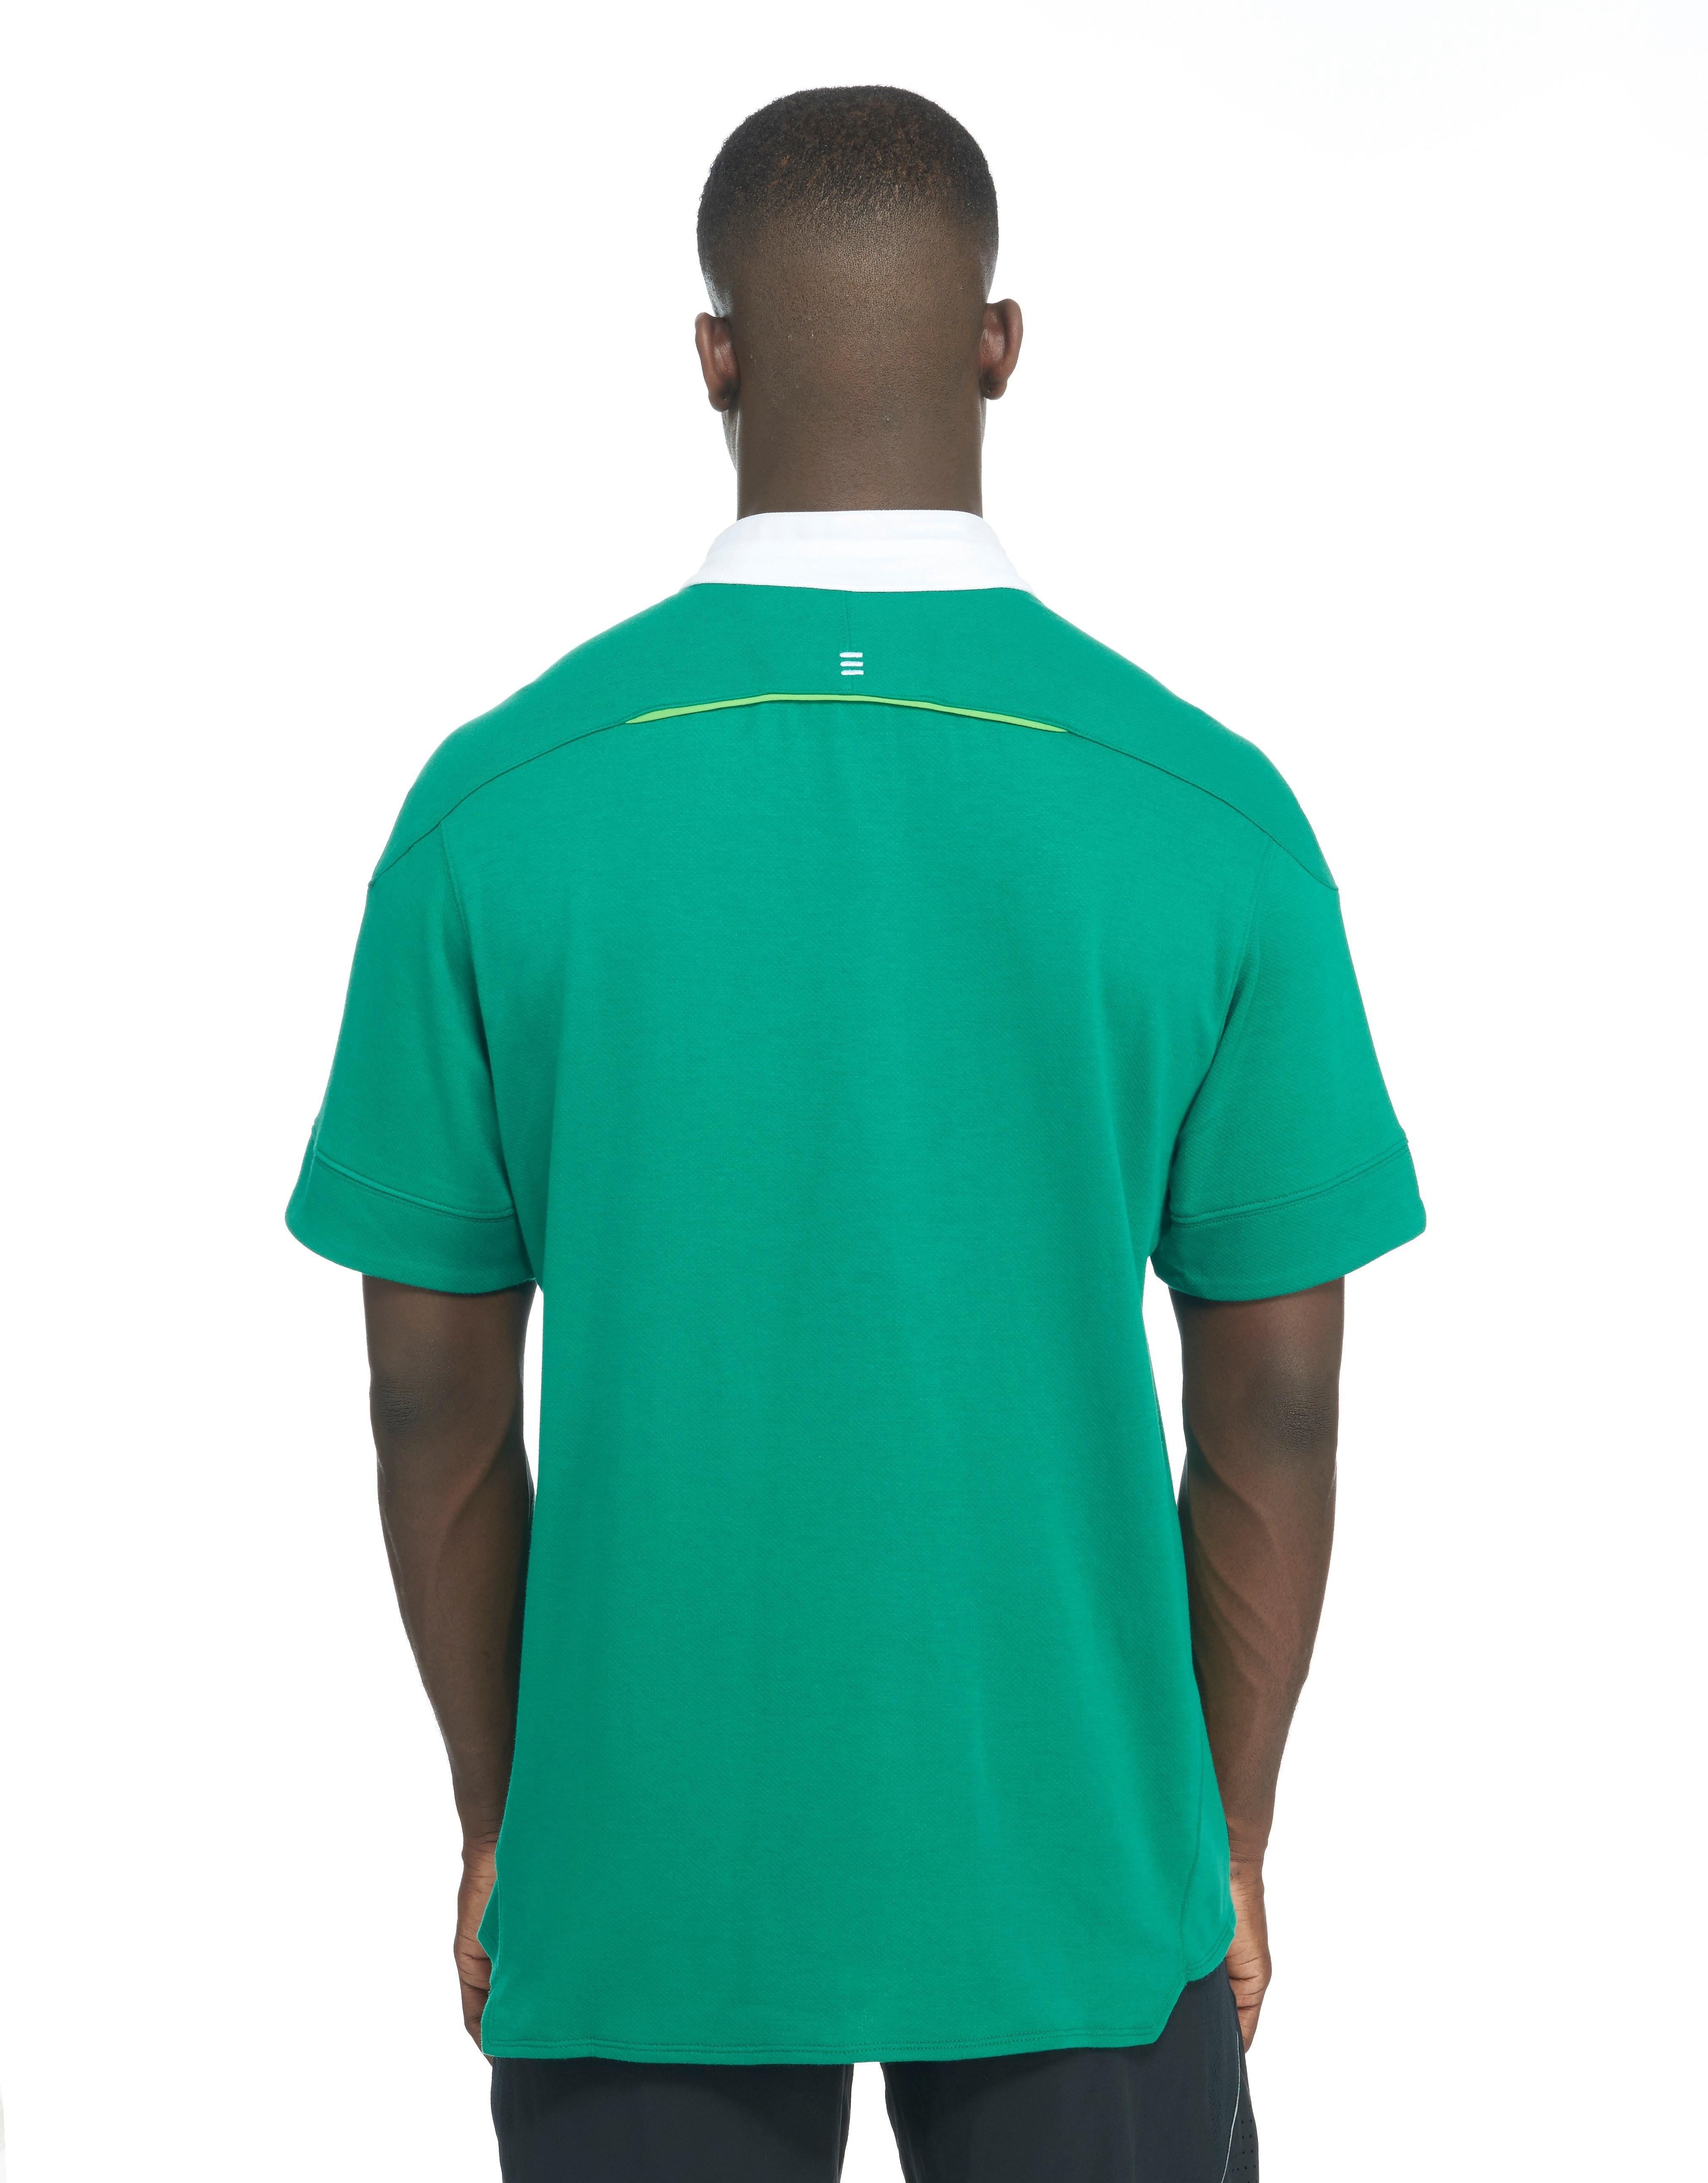 Canterbury IRFU 2016 Home Classic Shirt